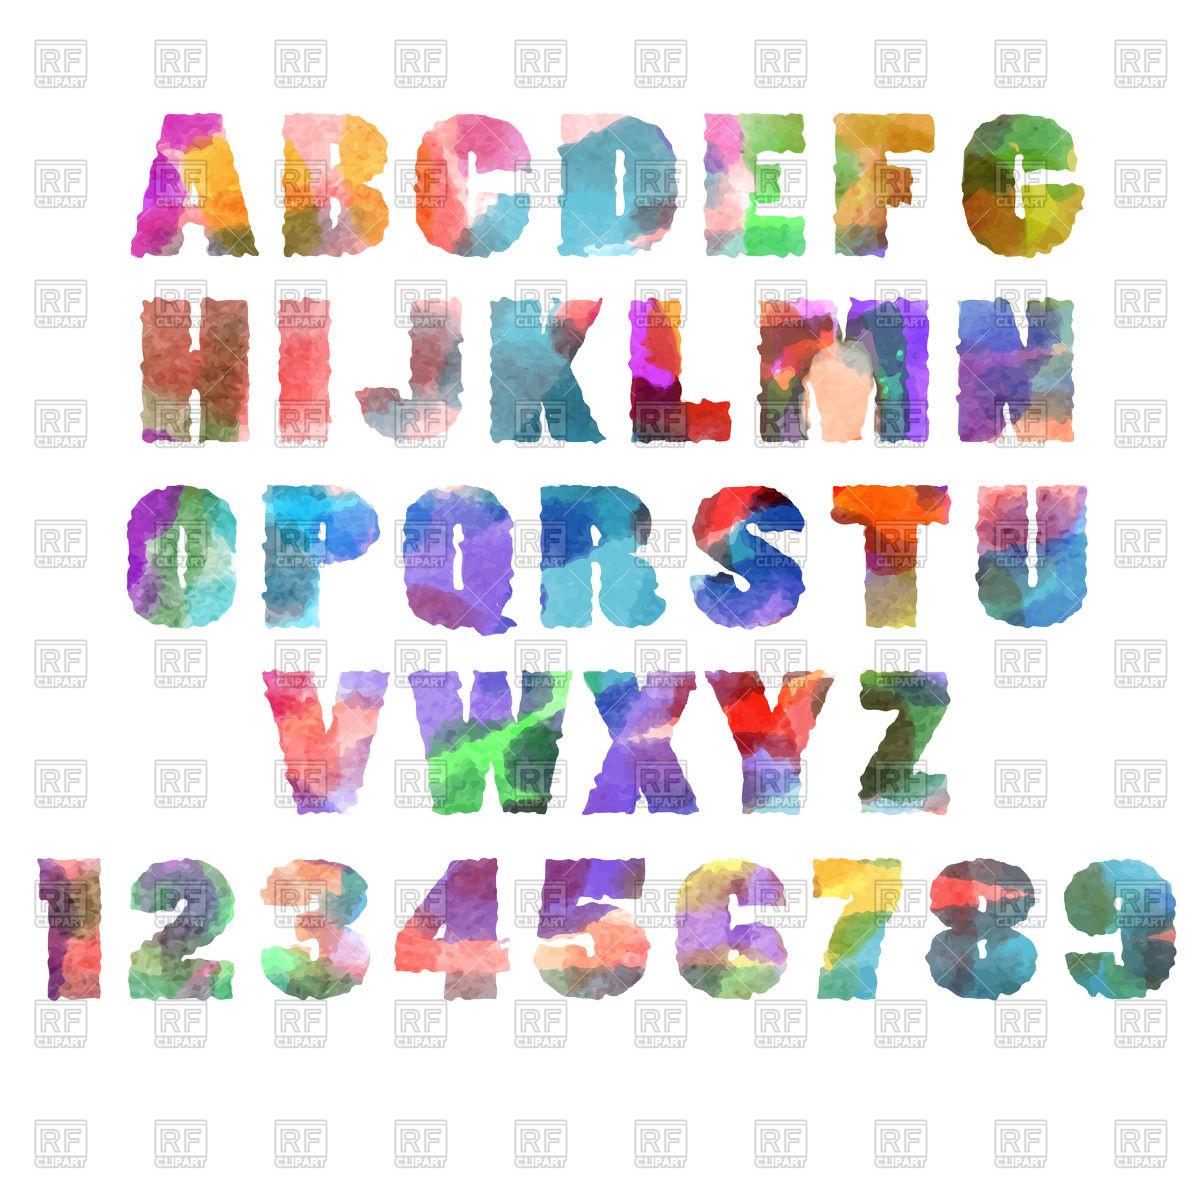 1200x1200 Alphabet (Font) Letters With Watercolor Or Aquarelle Texture